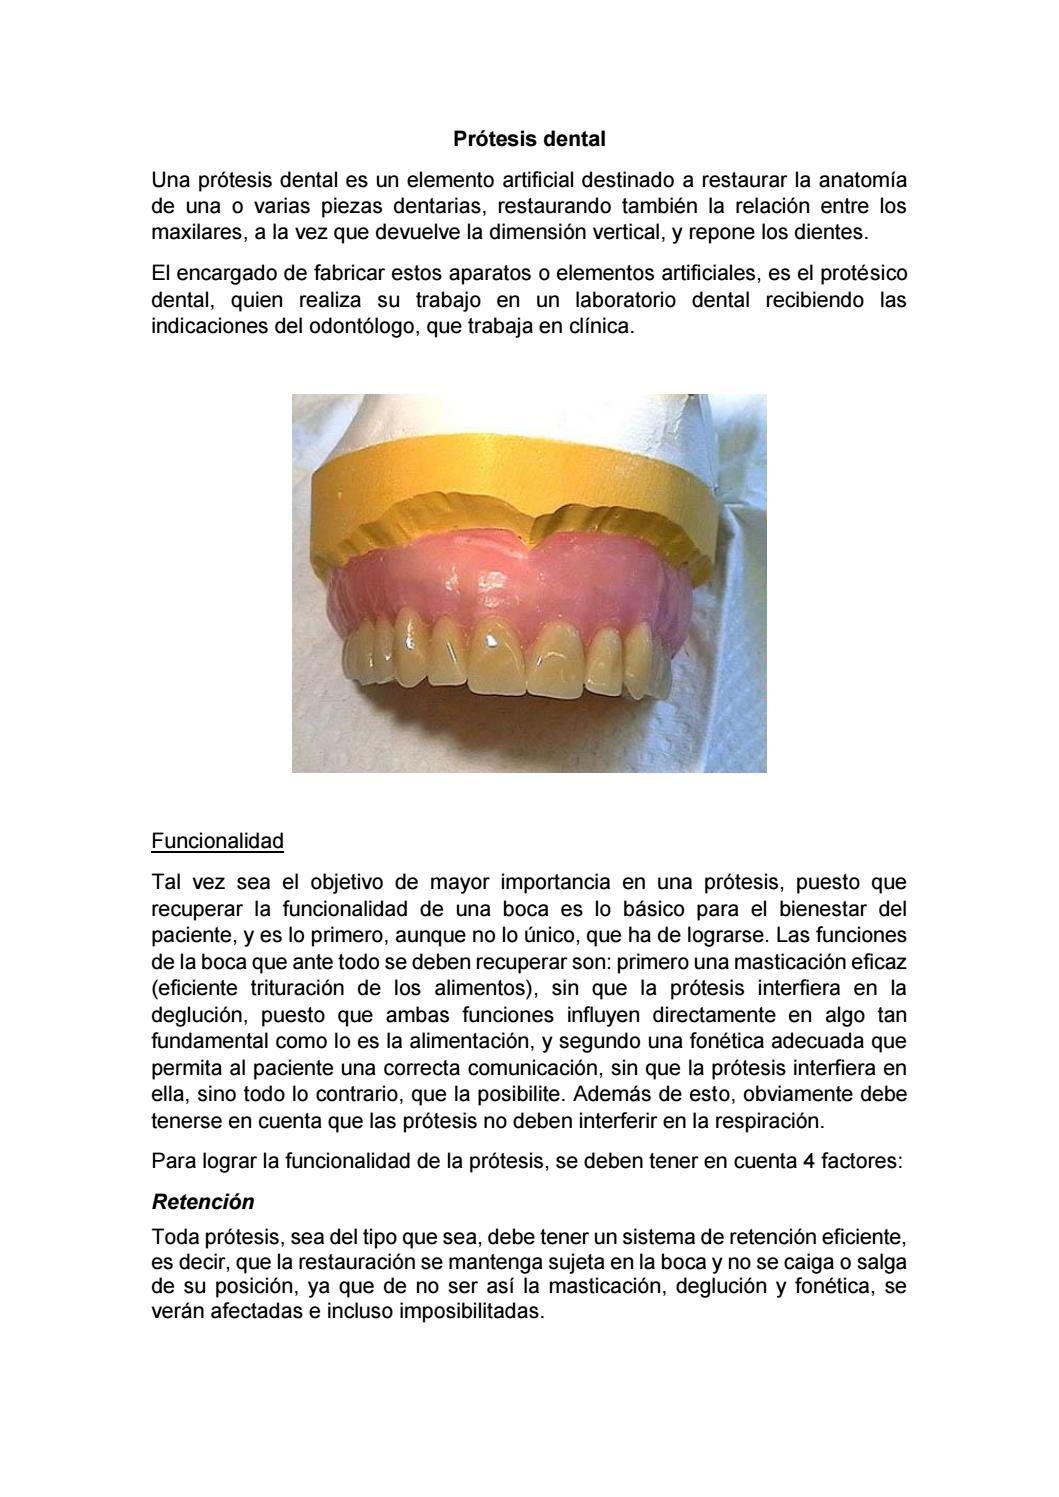 Prótesis dental by Paola Pacurucu - issuu